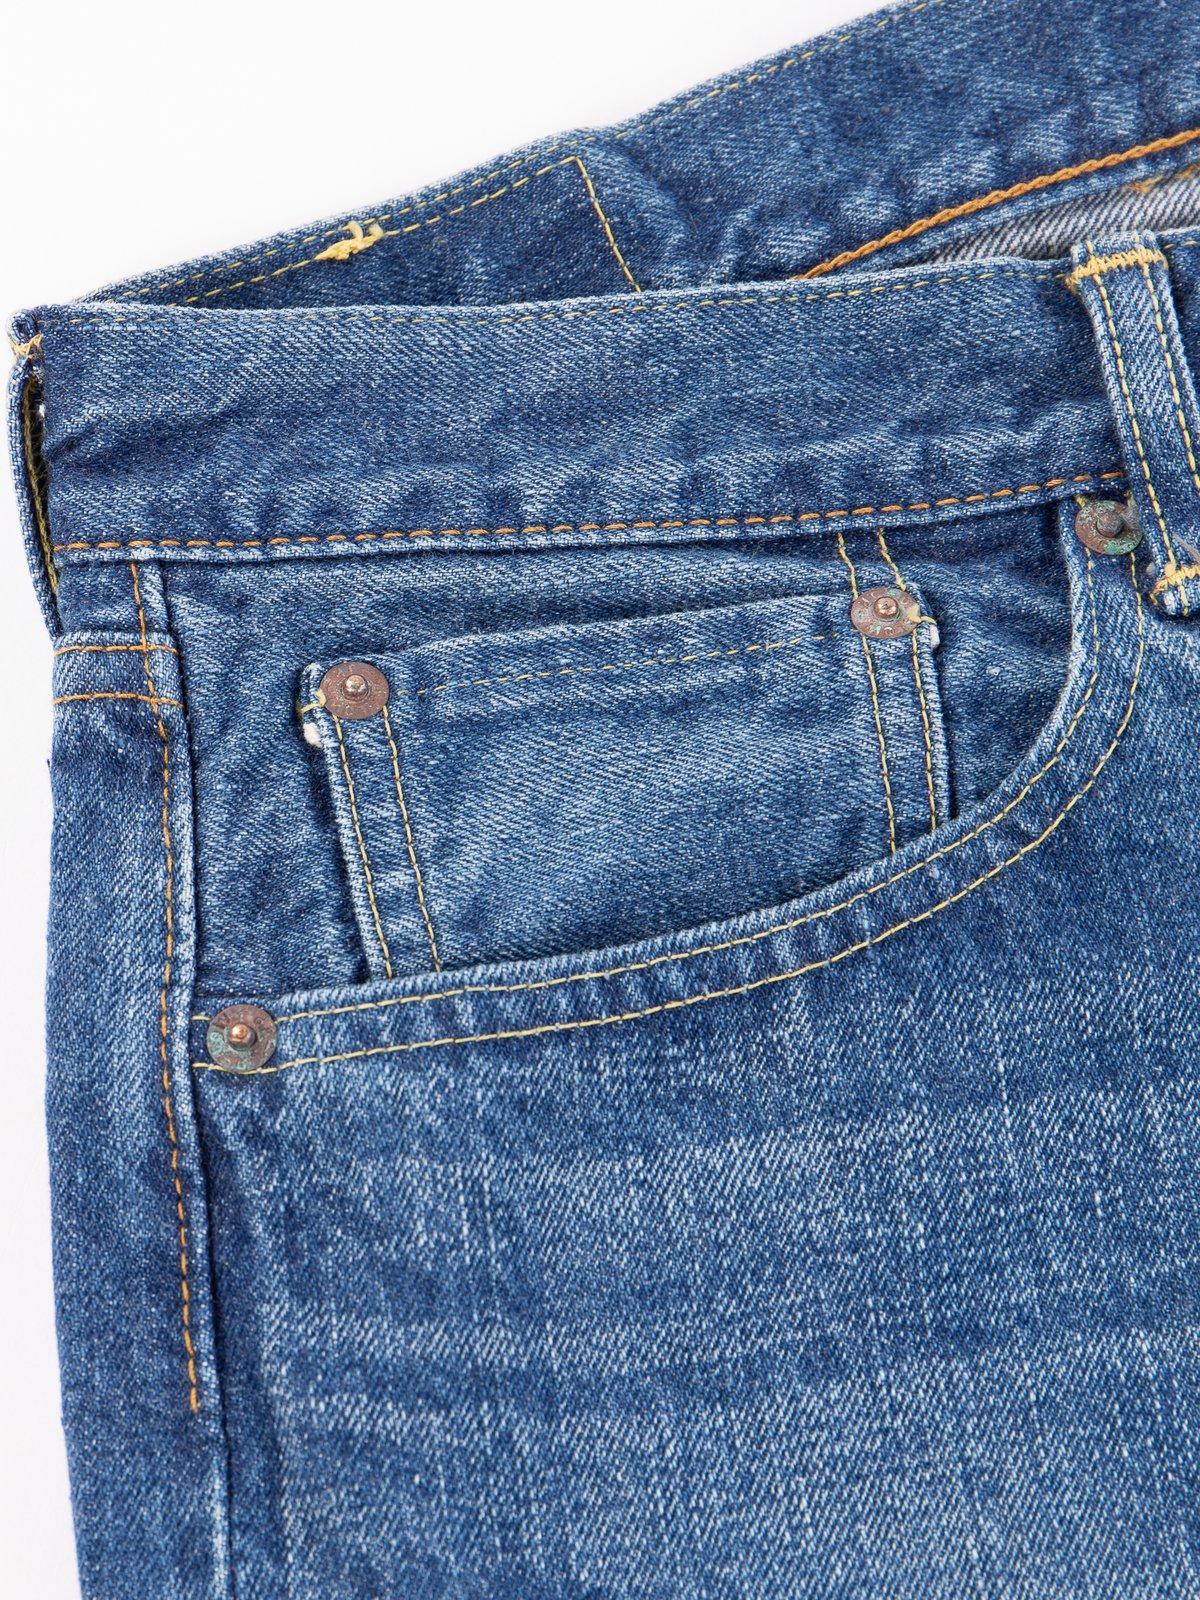 2 Year Wash 105 Standard 5 Pocket Jean - Image 5